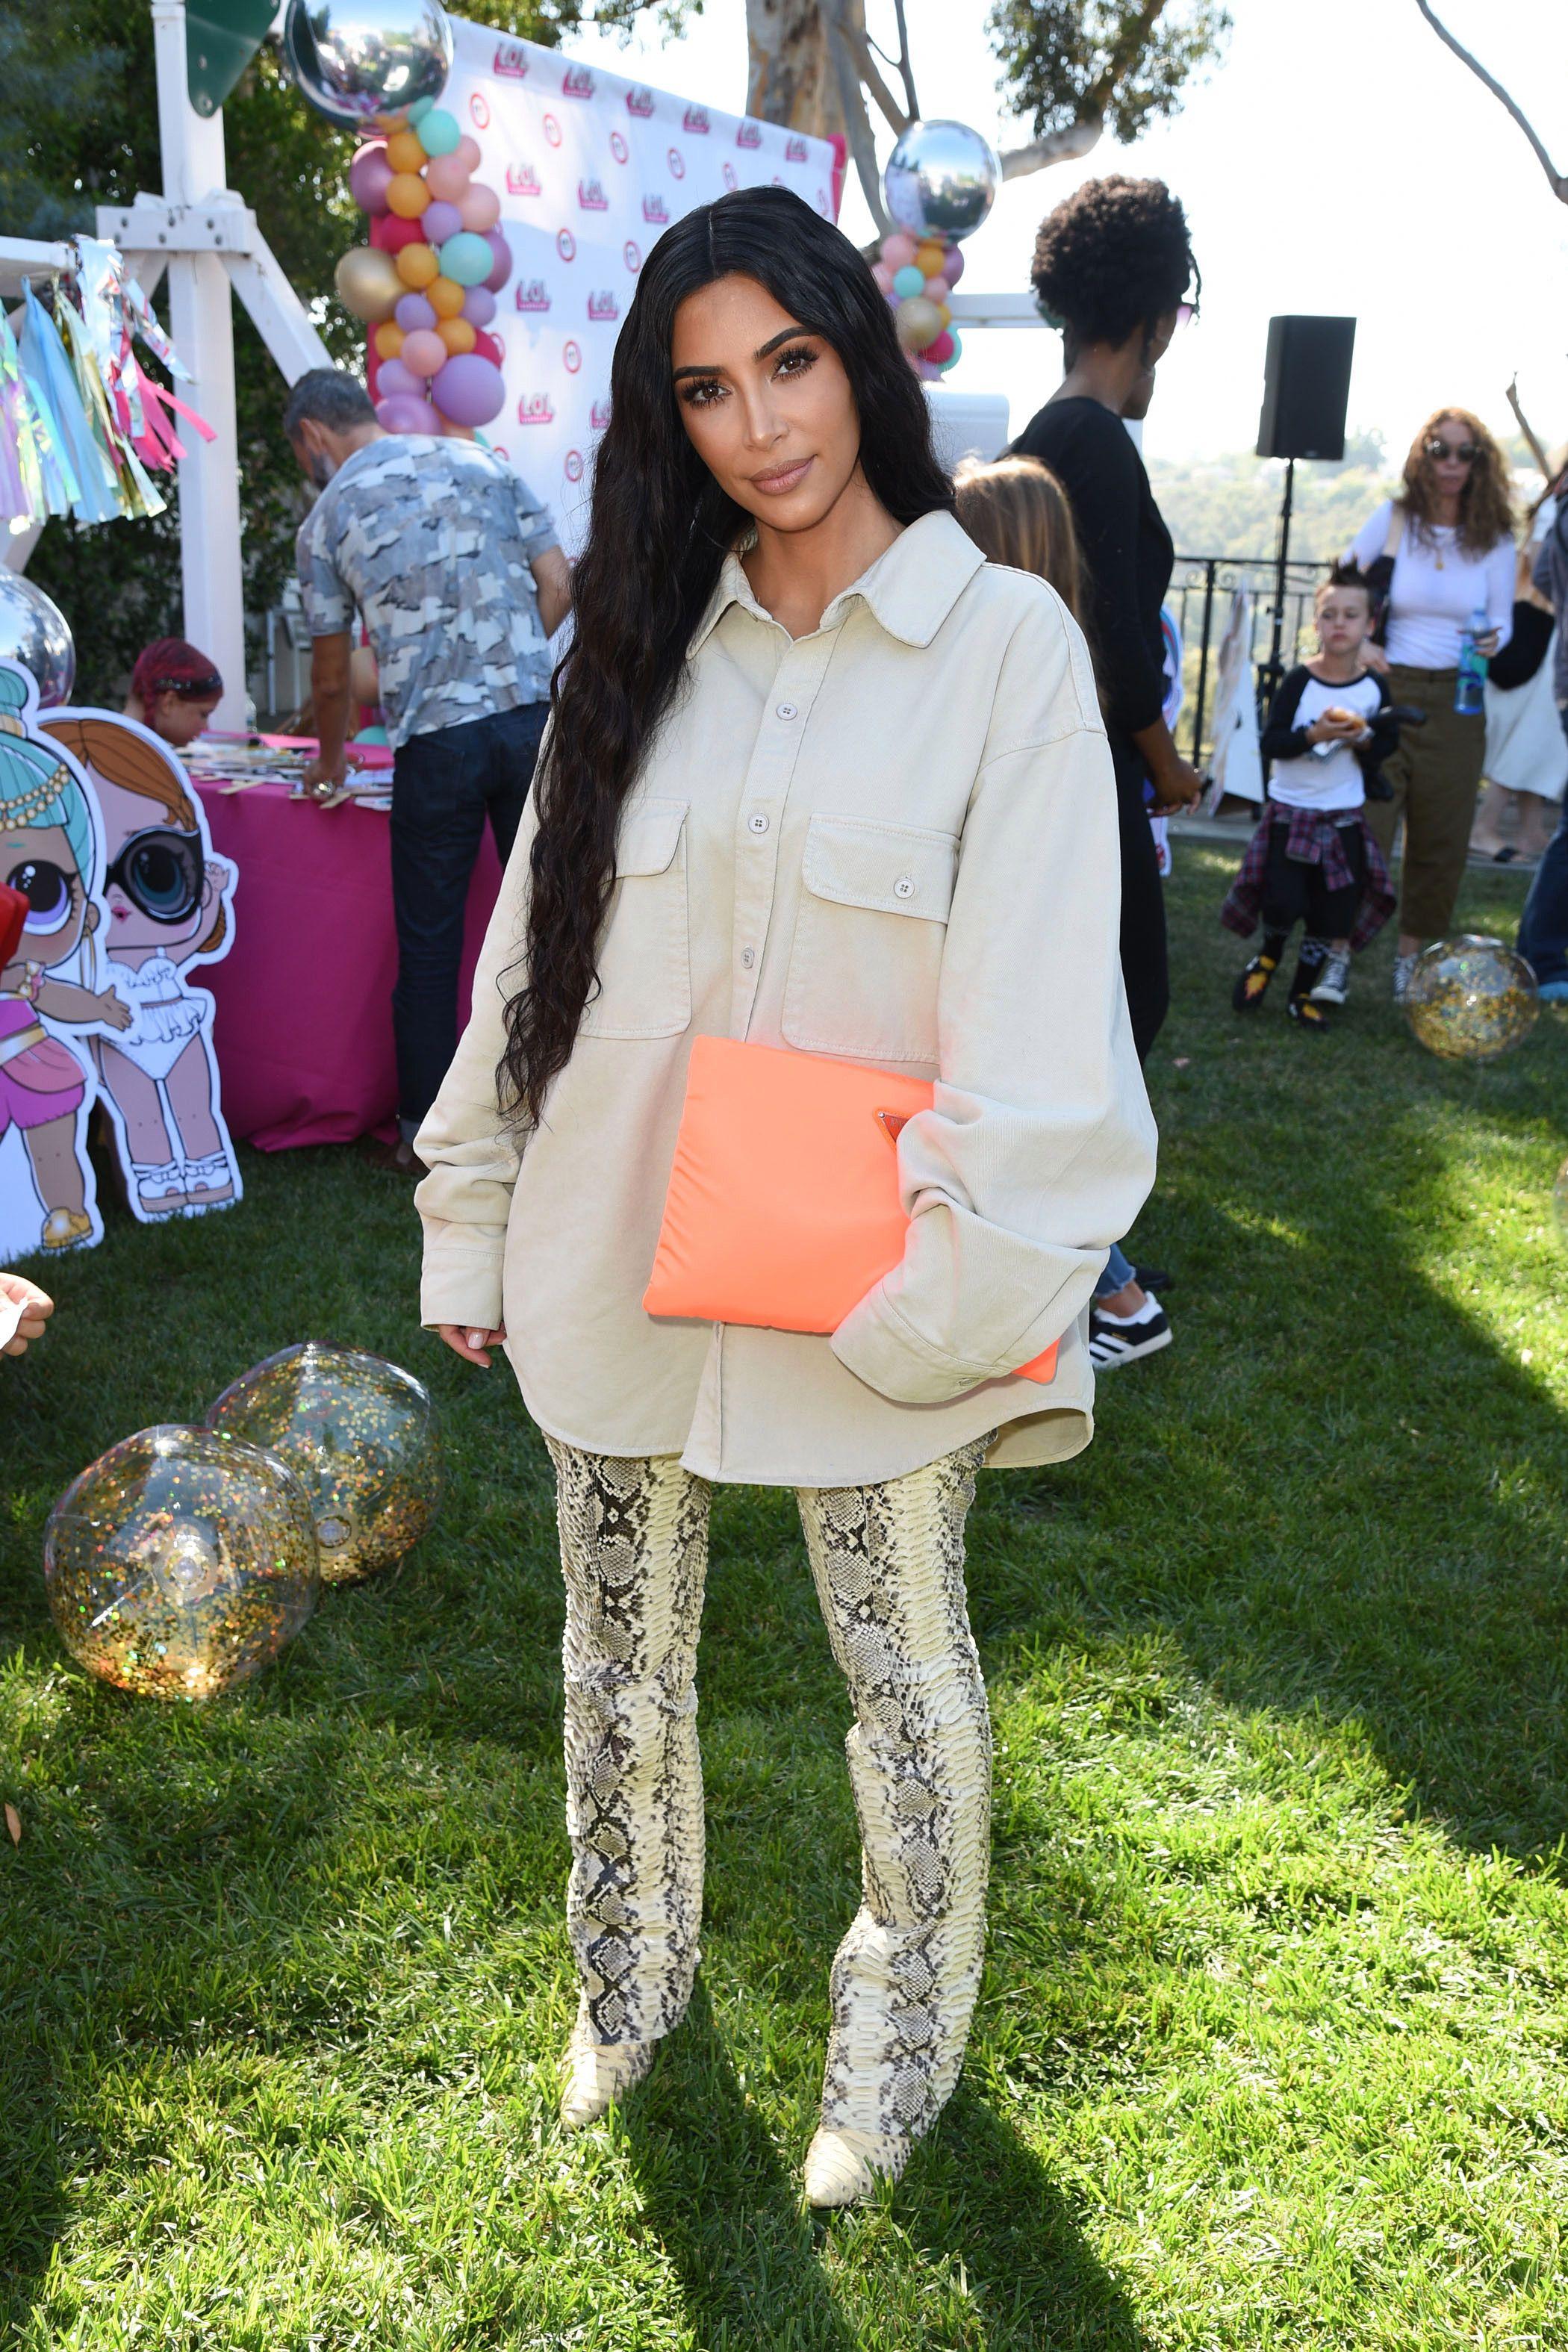 Kim Kardashian's Kimono Controversy Proves A Leopard Never Changes Its Spots